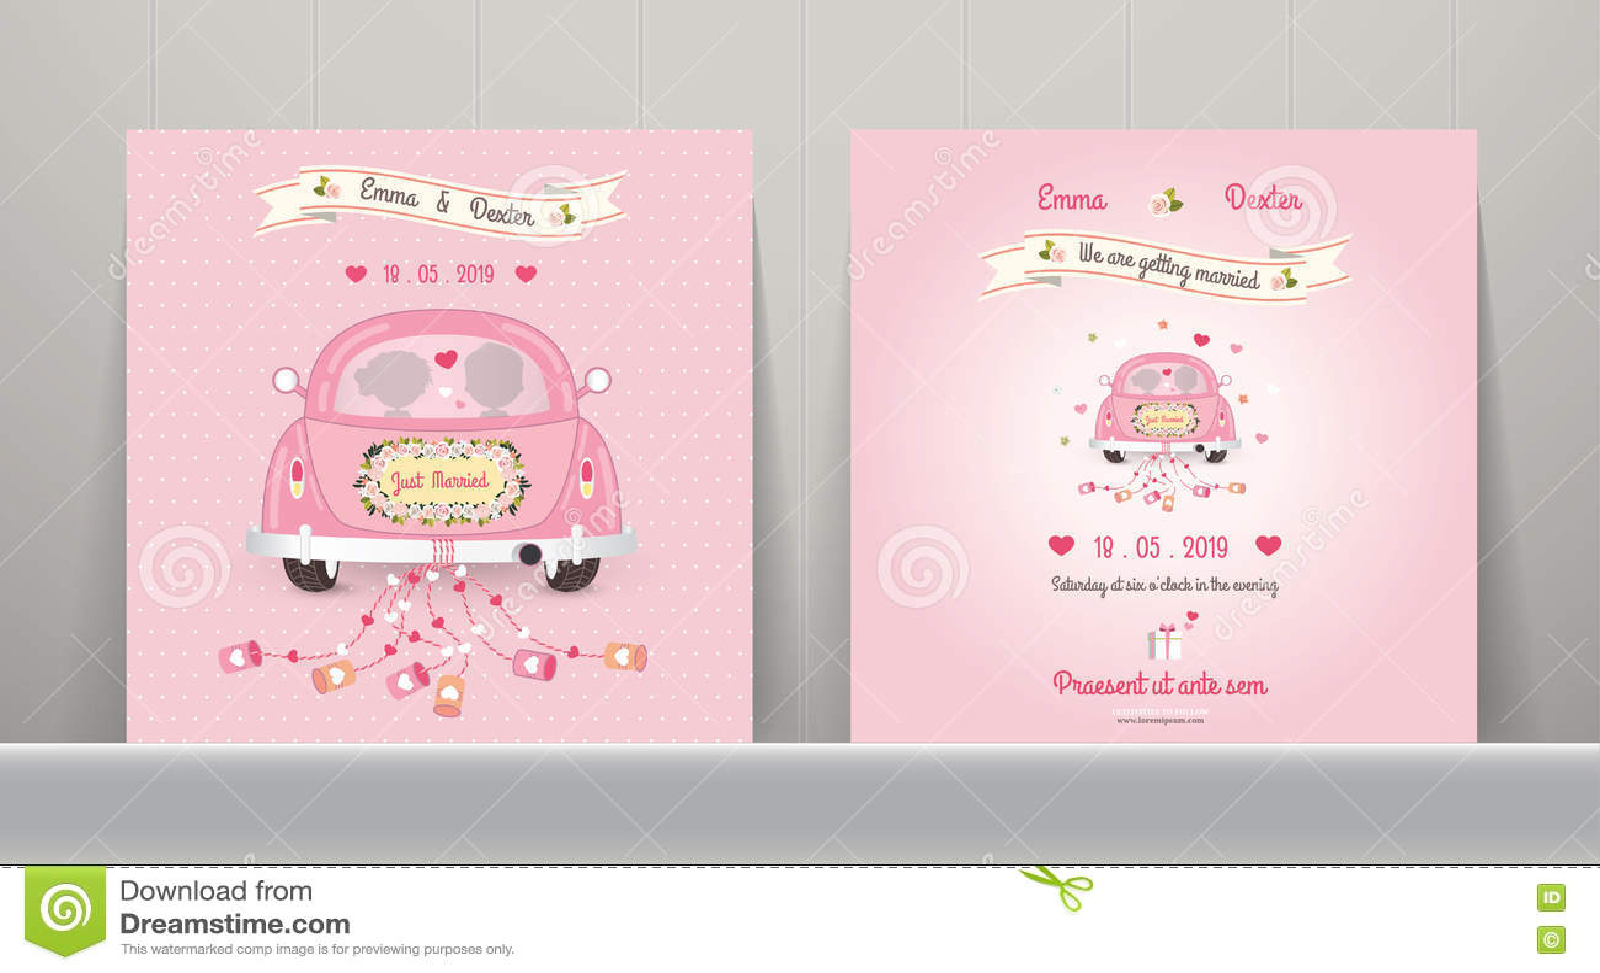 Just Married Car Wedding Invitation Card Stock Vector